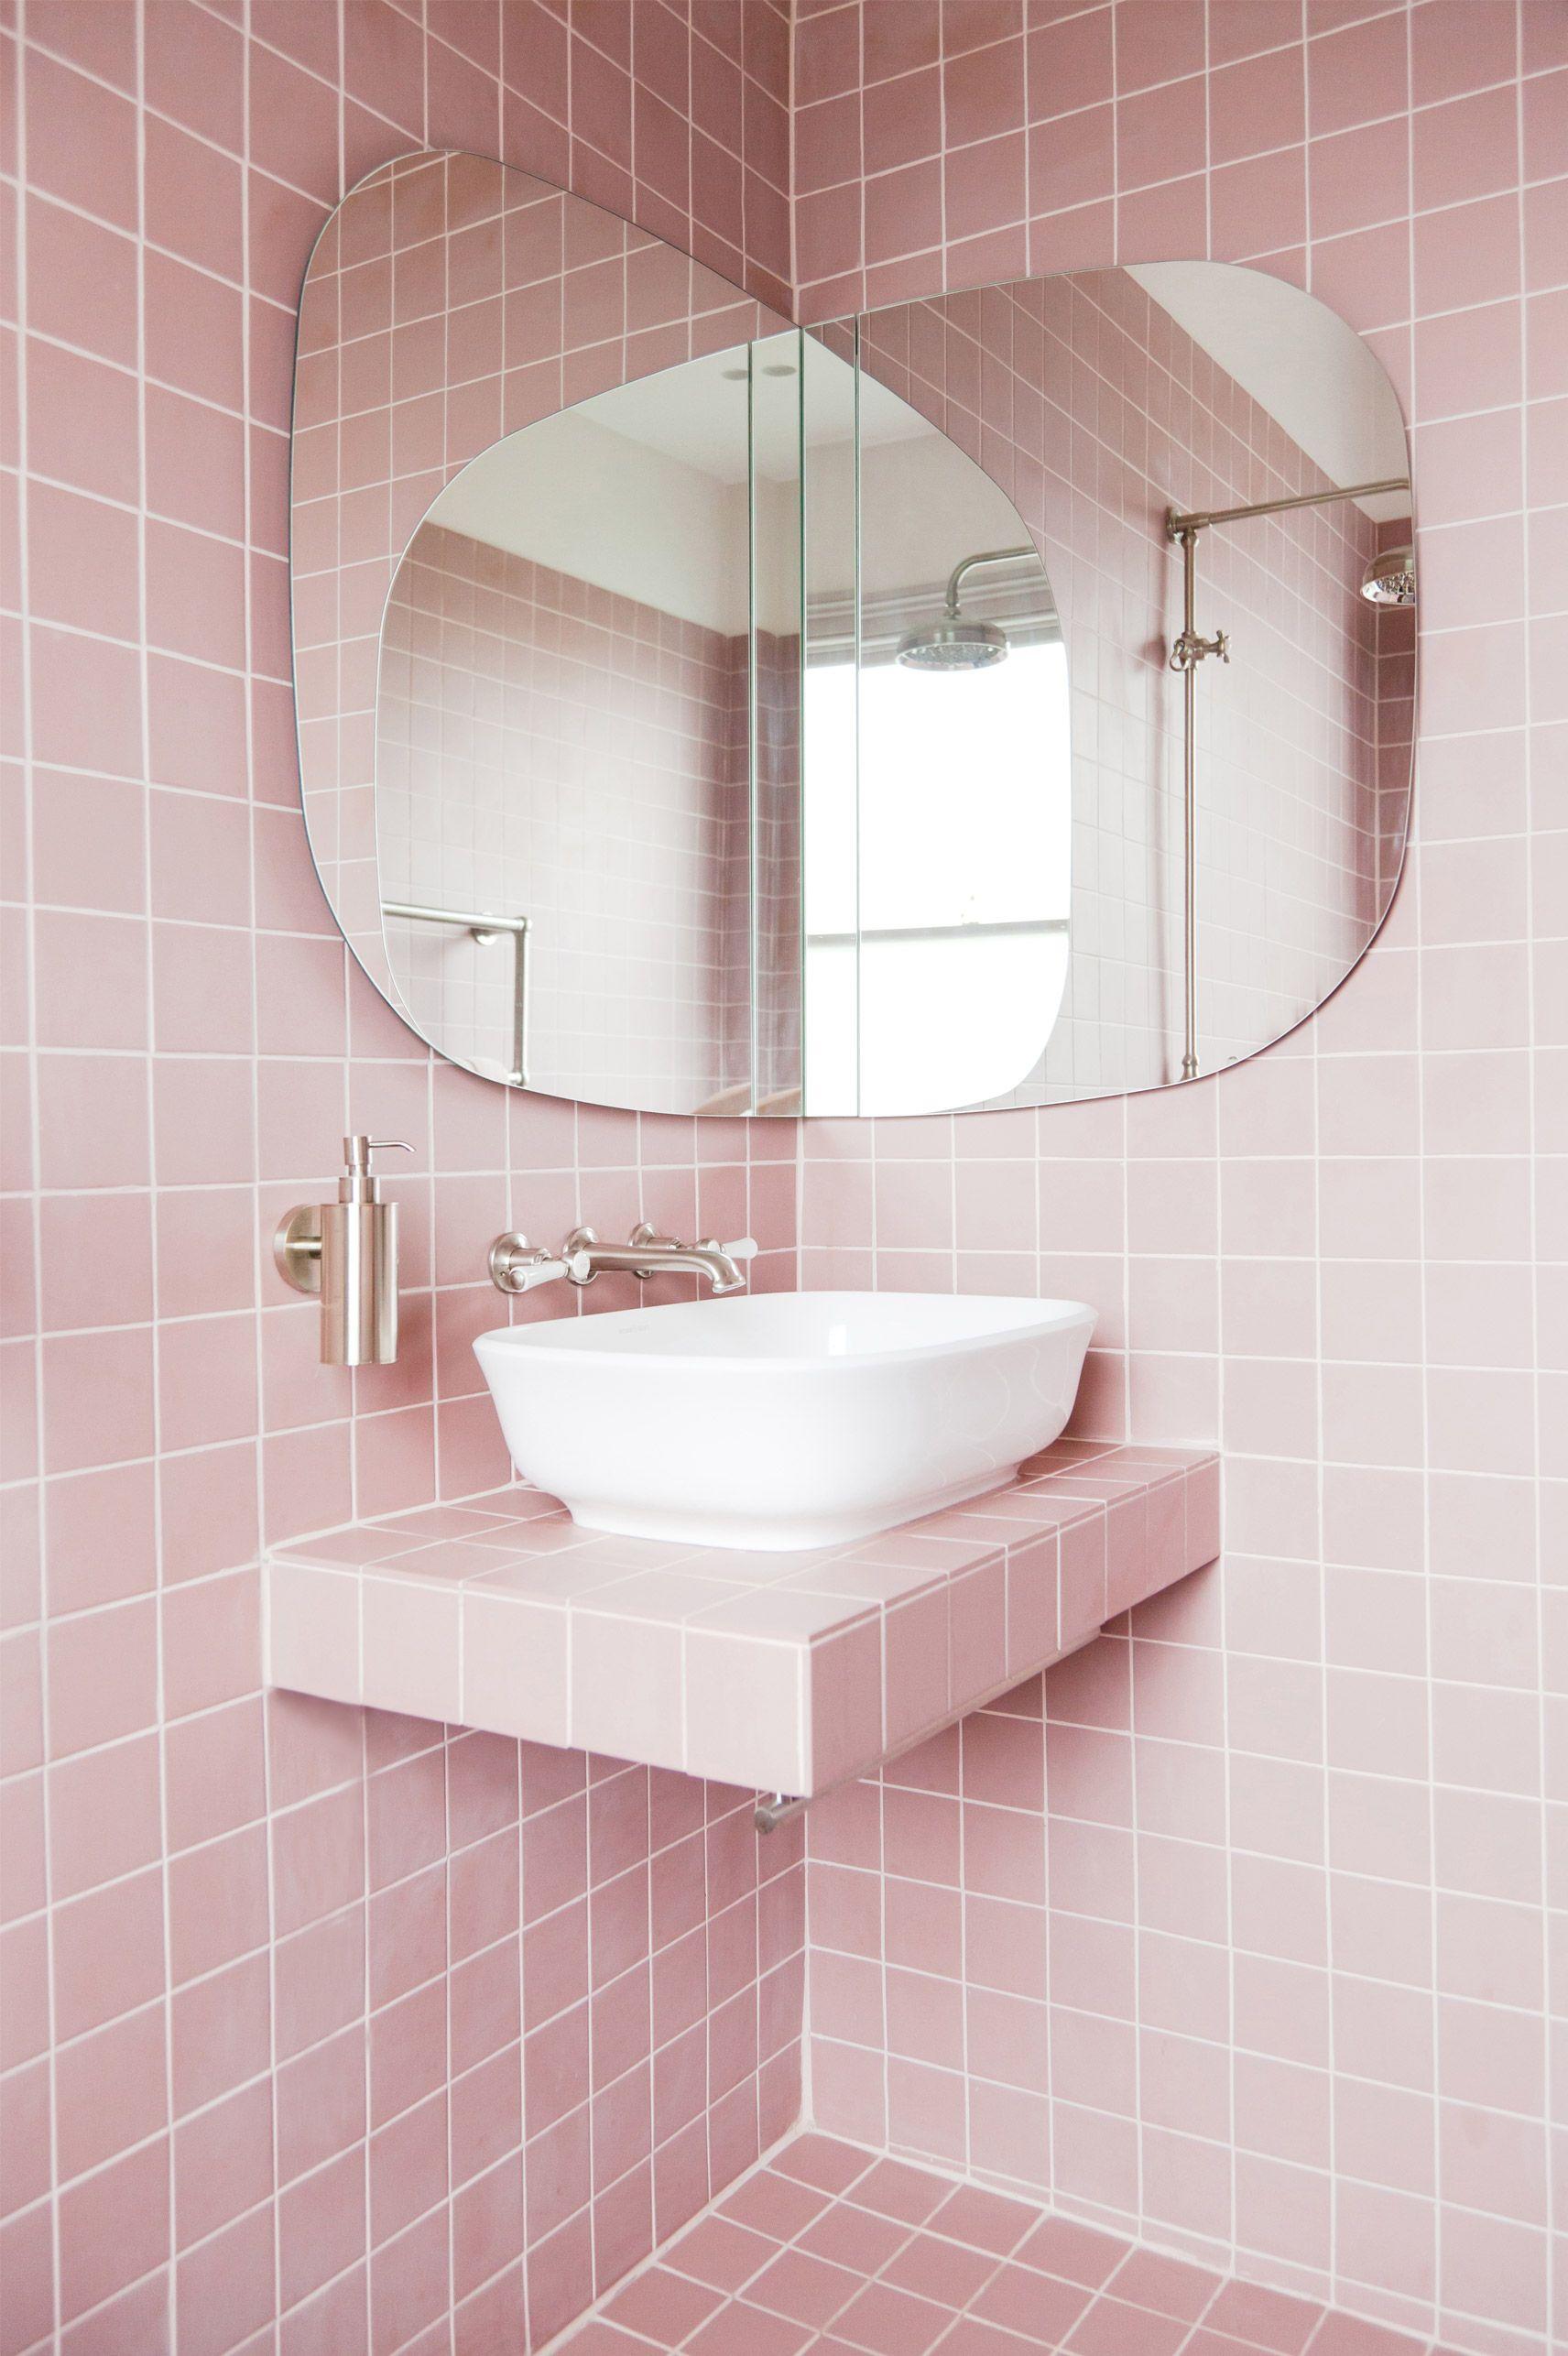 2LG Studio Our dream pink bathroom